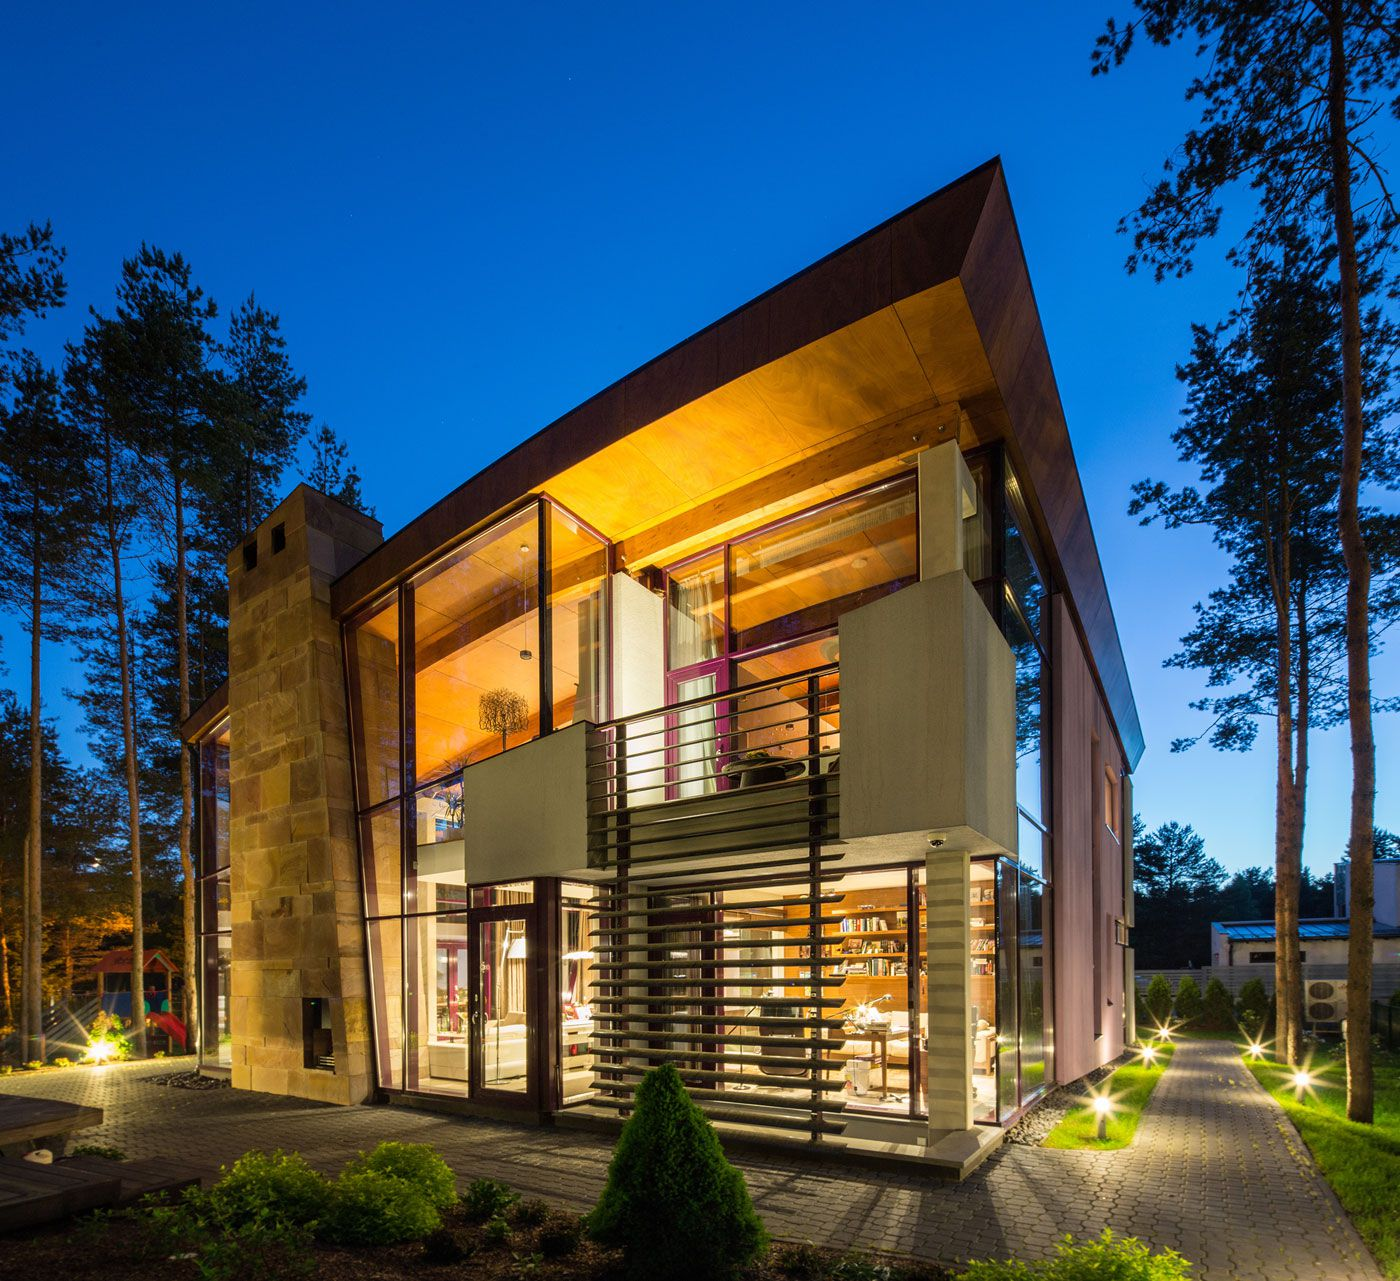 Ultramodern Villa Estebania Near the Forrest by Arch-D-17